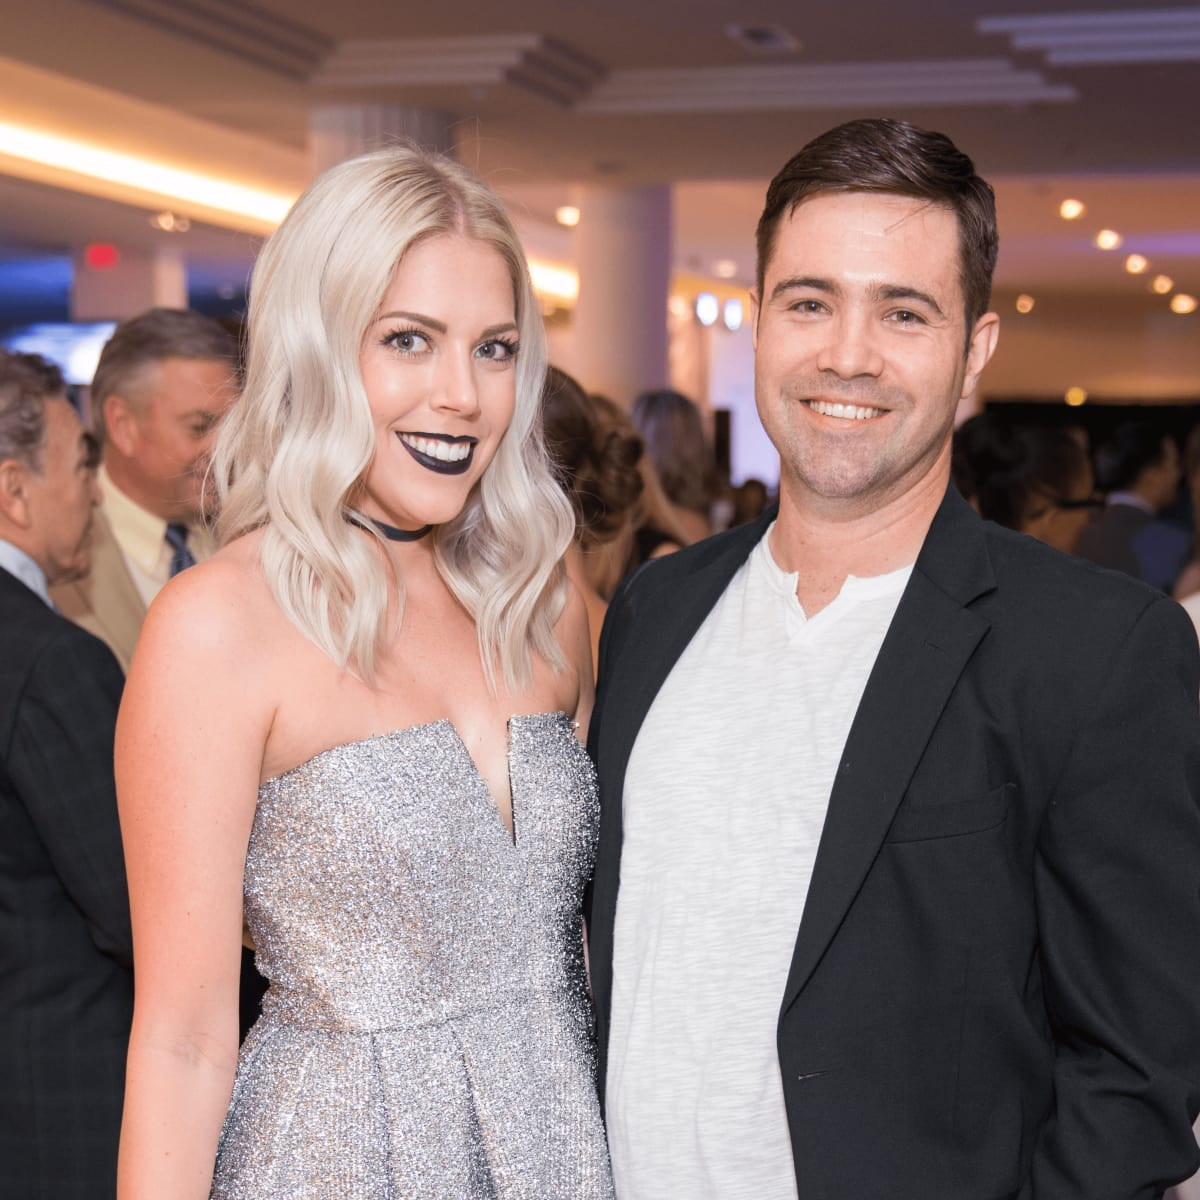 Fresh Faces of Fashion 8/16, Meagan Thomason, Joshua Finch